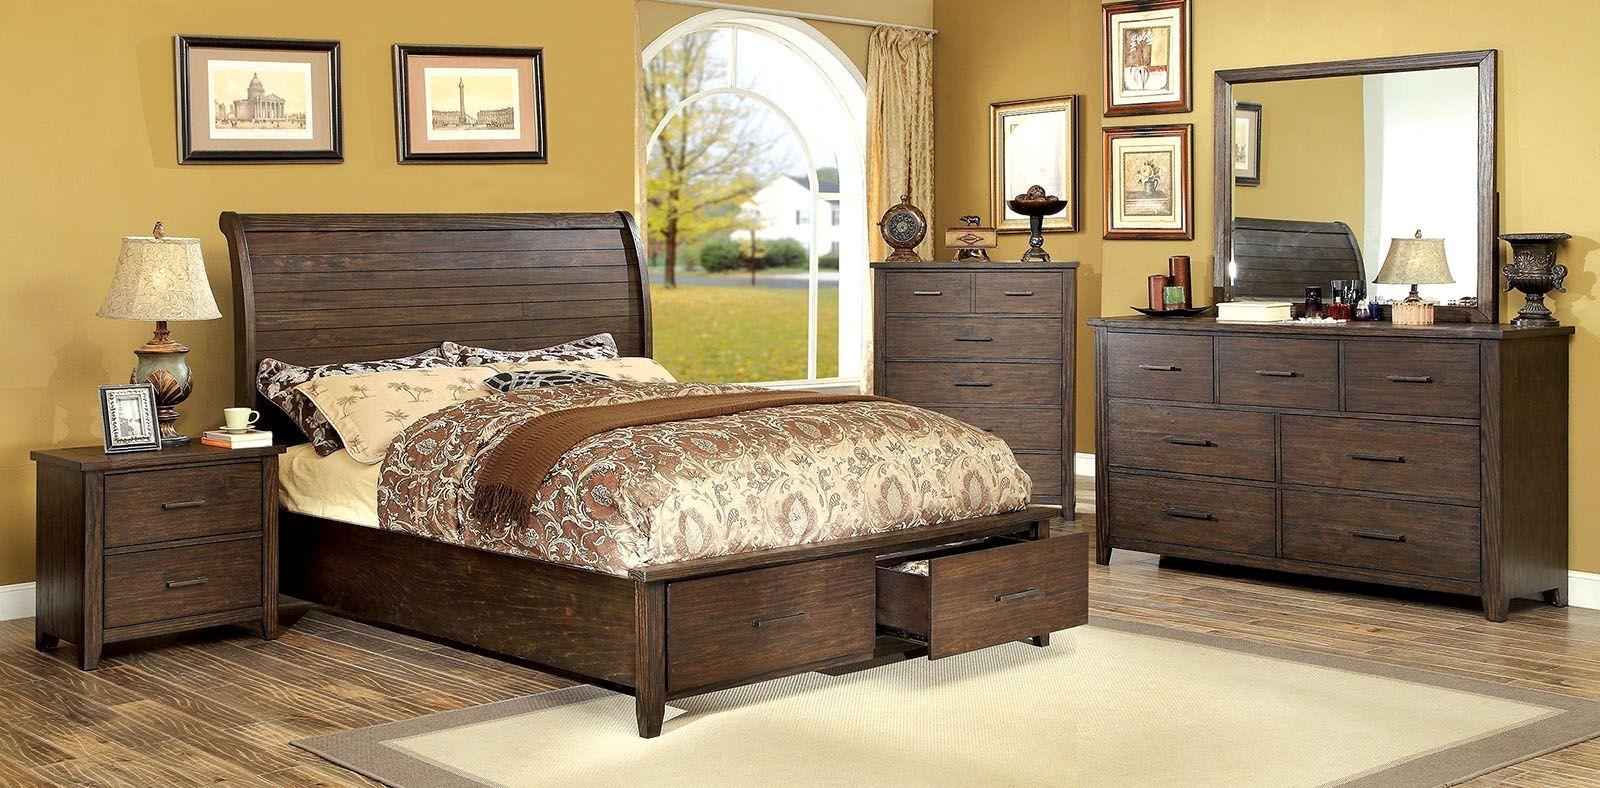 Ribeira dark walnut storage bedroom set cm7252q for A america bedroom furniture